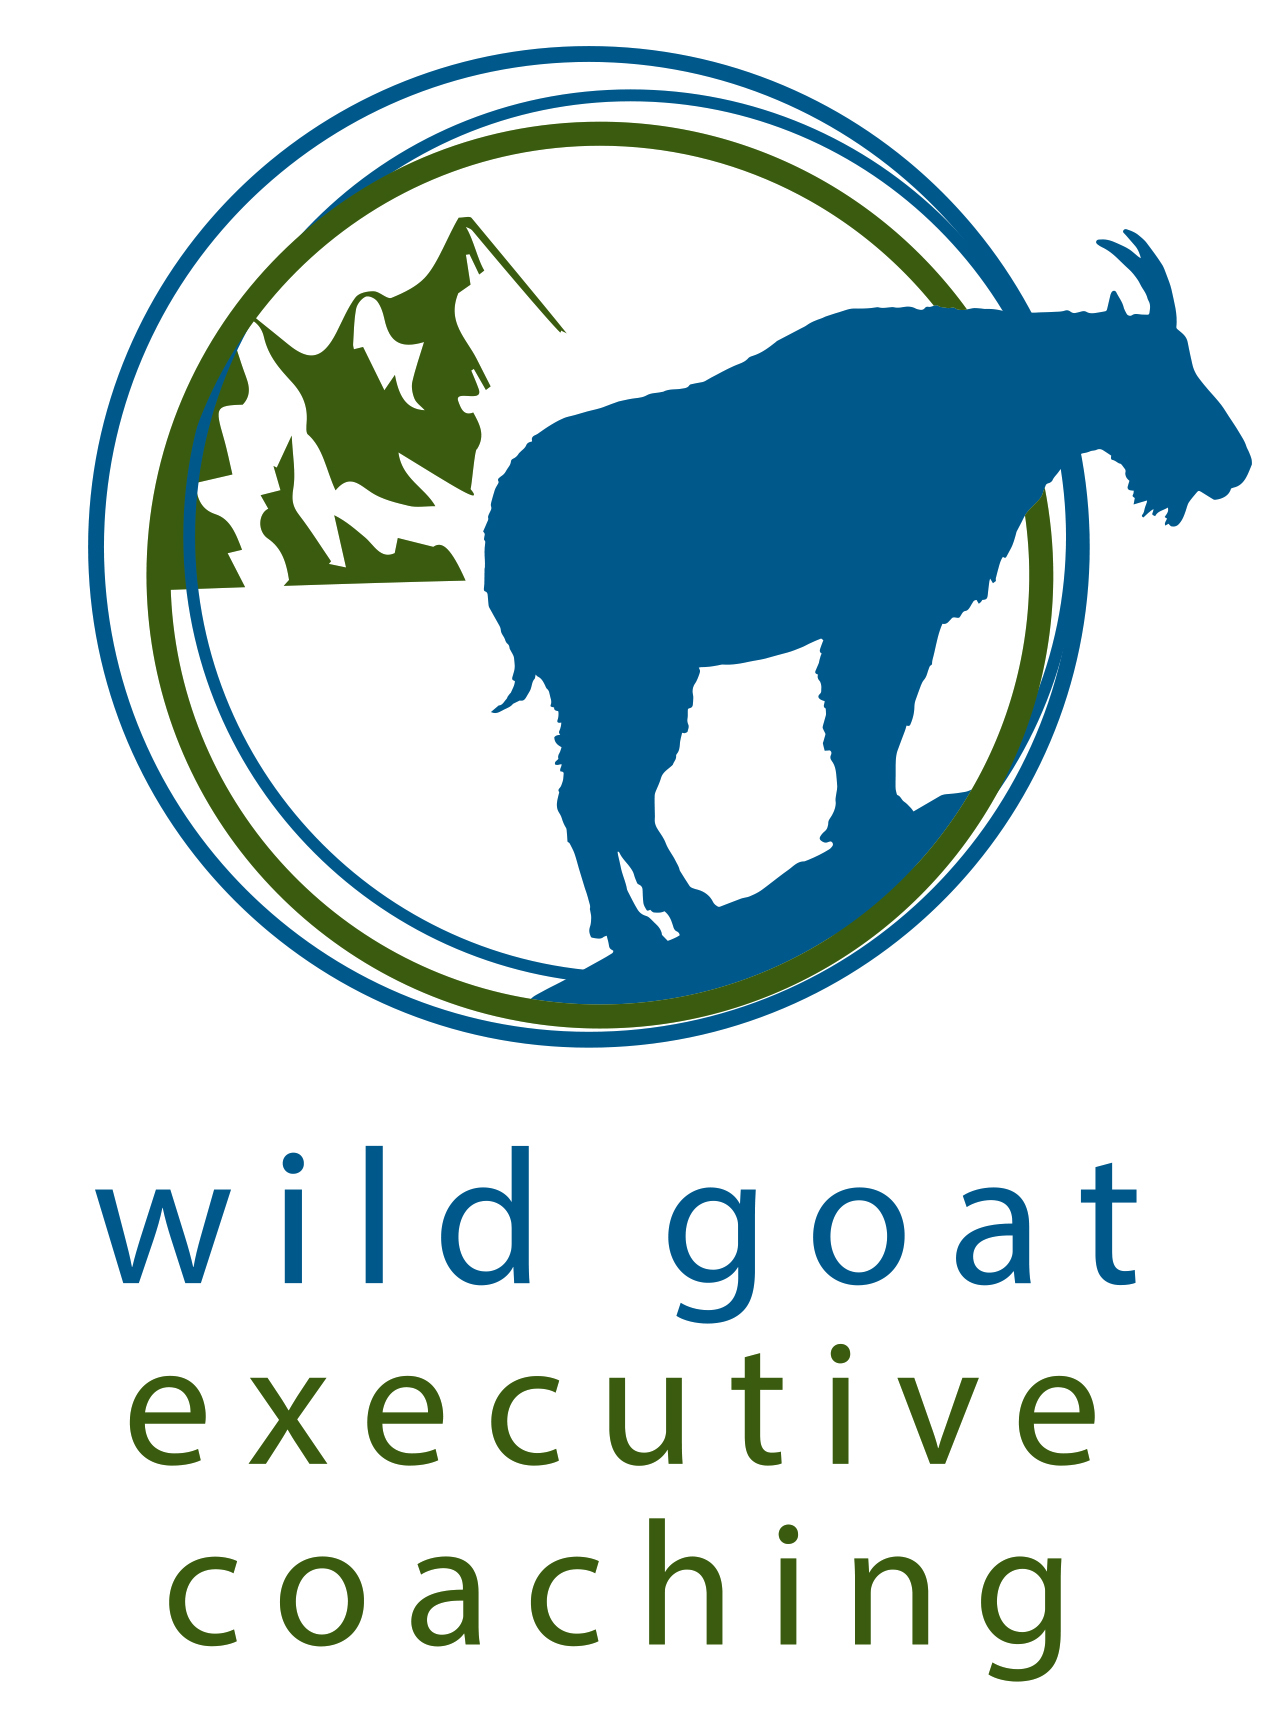 Wild Goat Executive Coaching